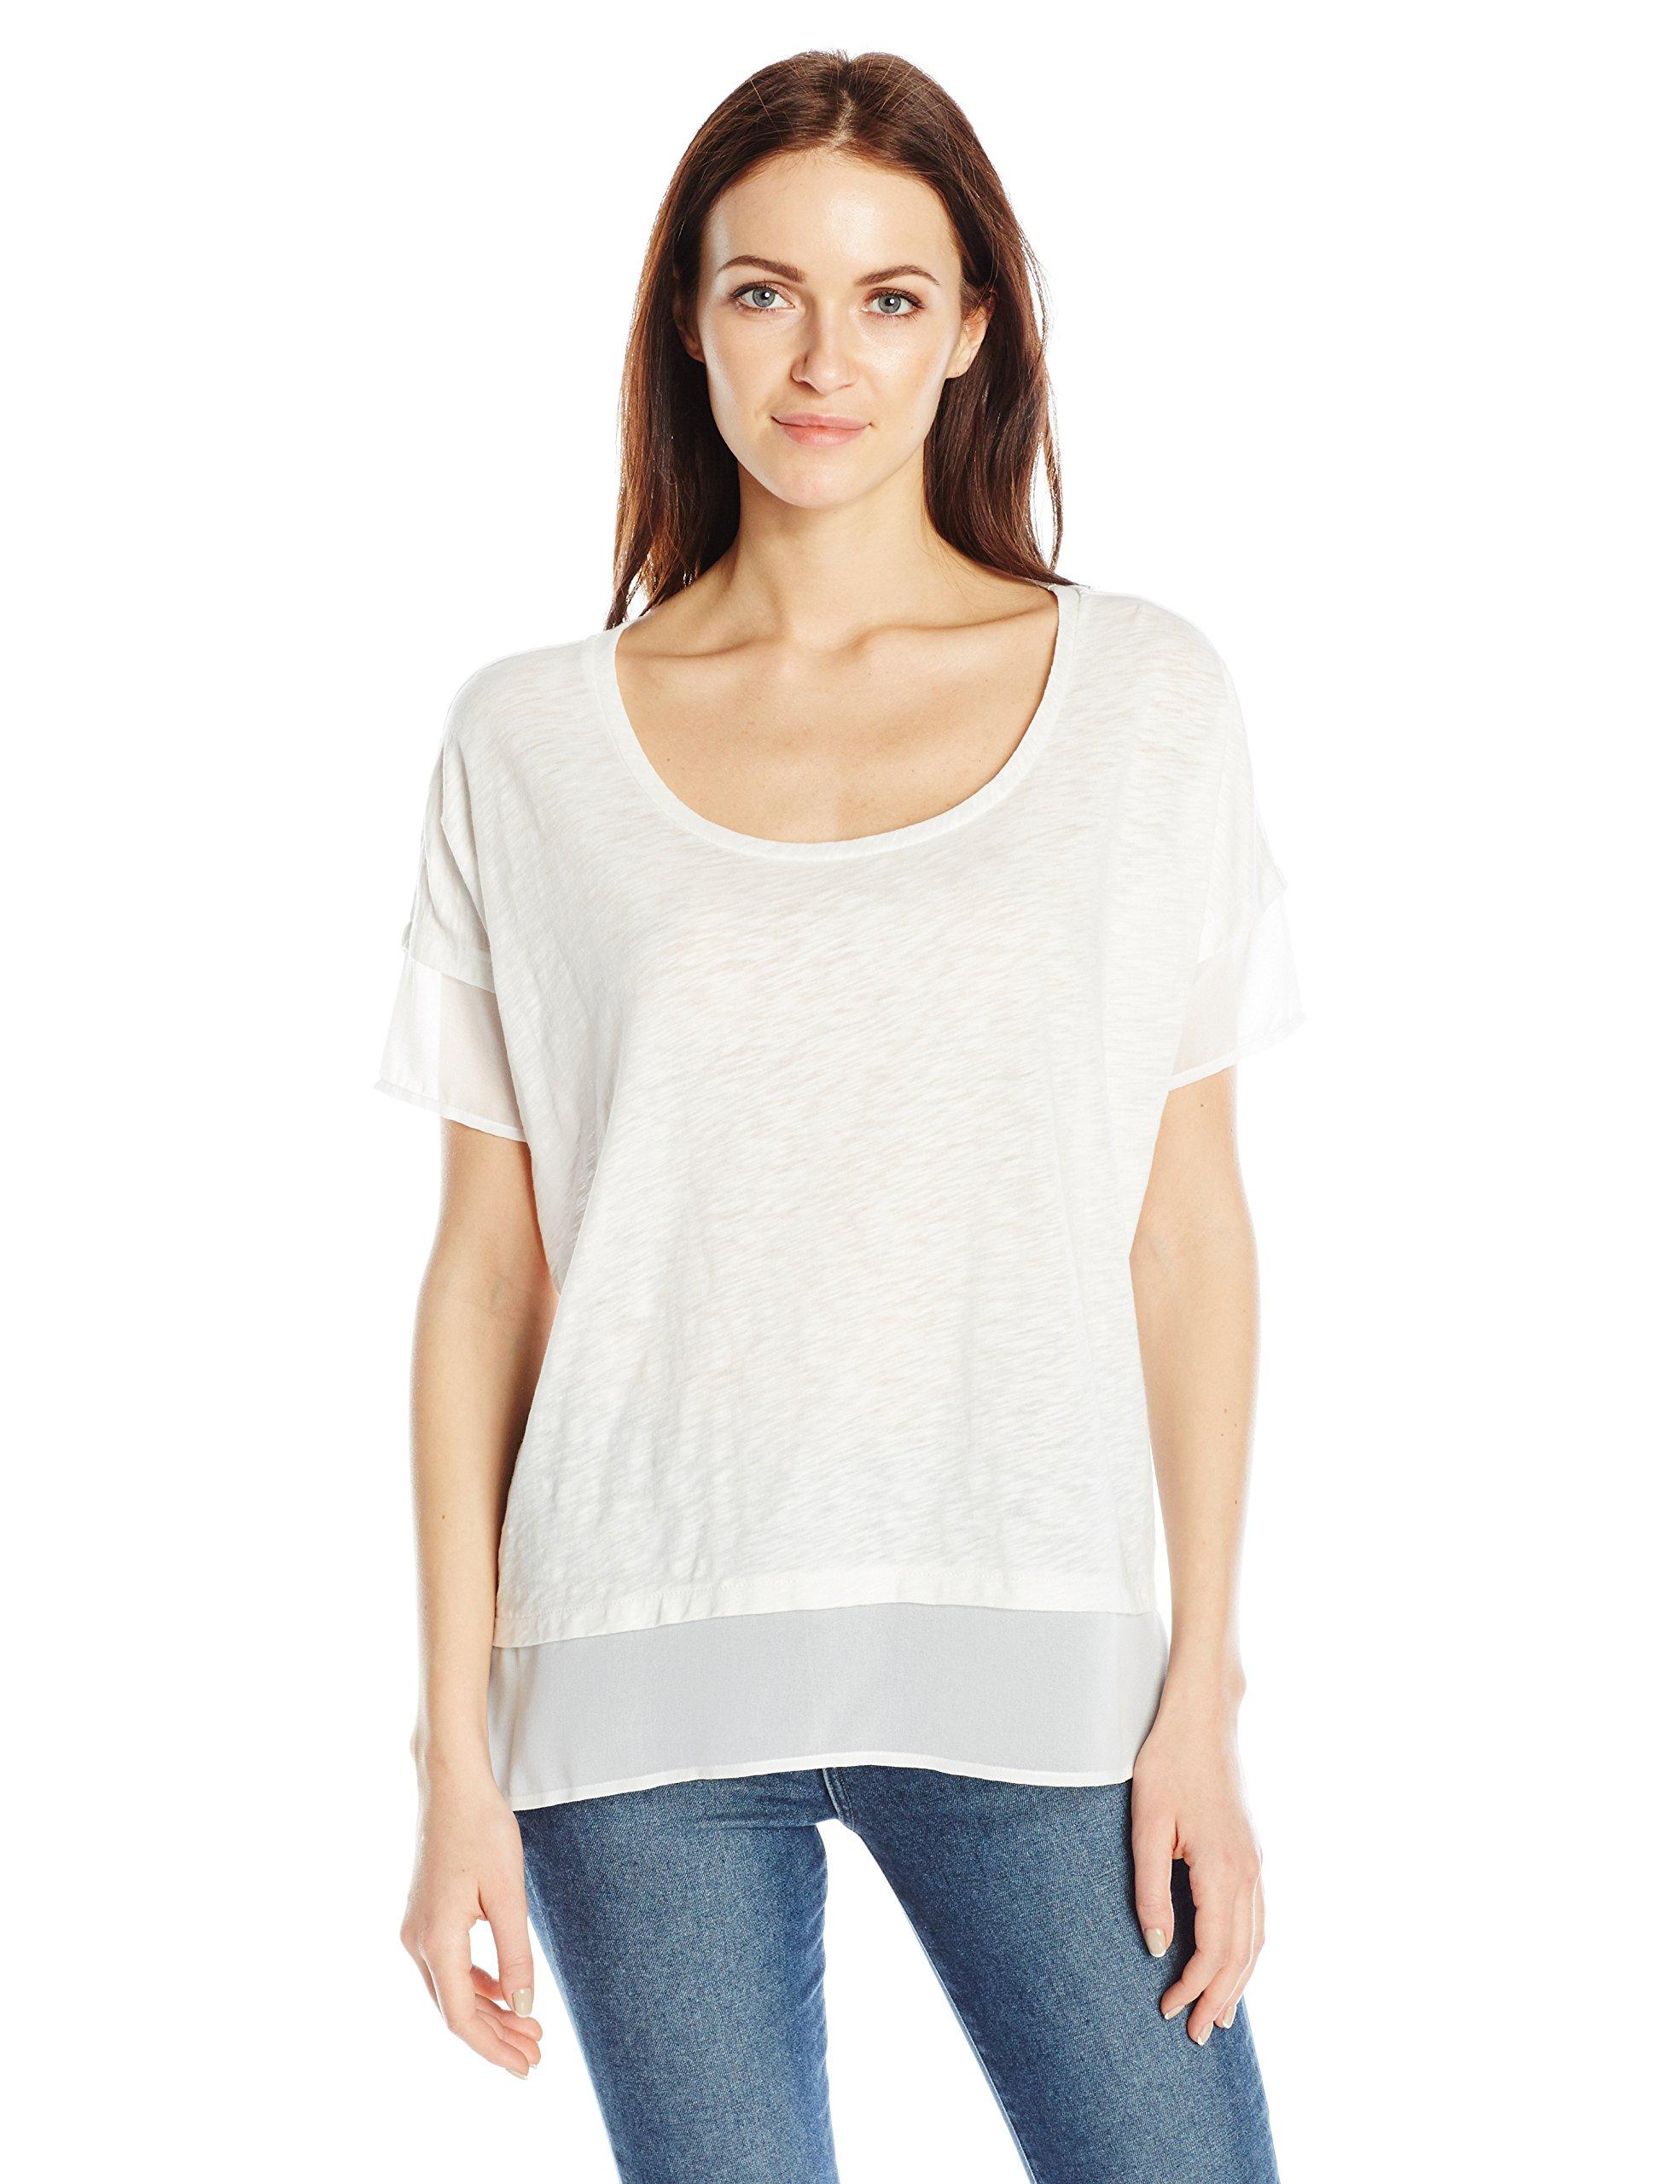 French Connection Women's Fresh Slub Jersey Top, Summer White, L